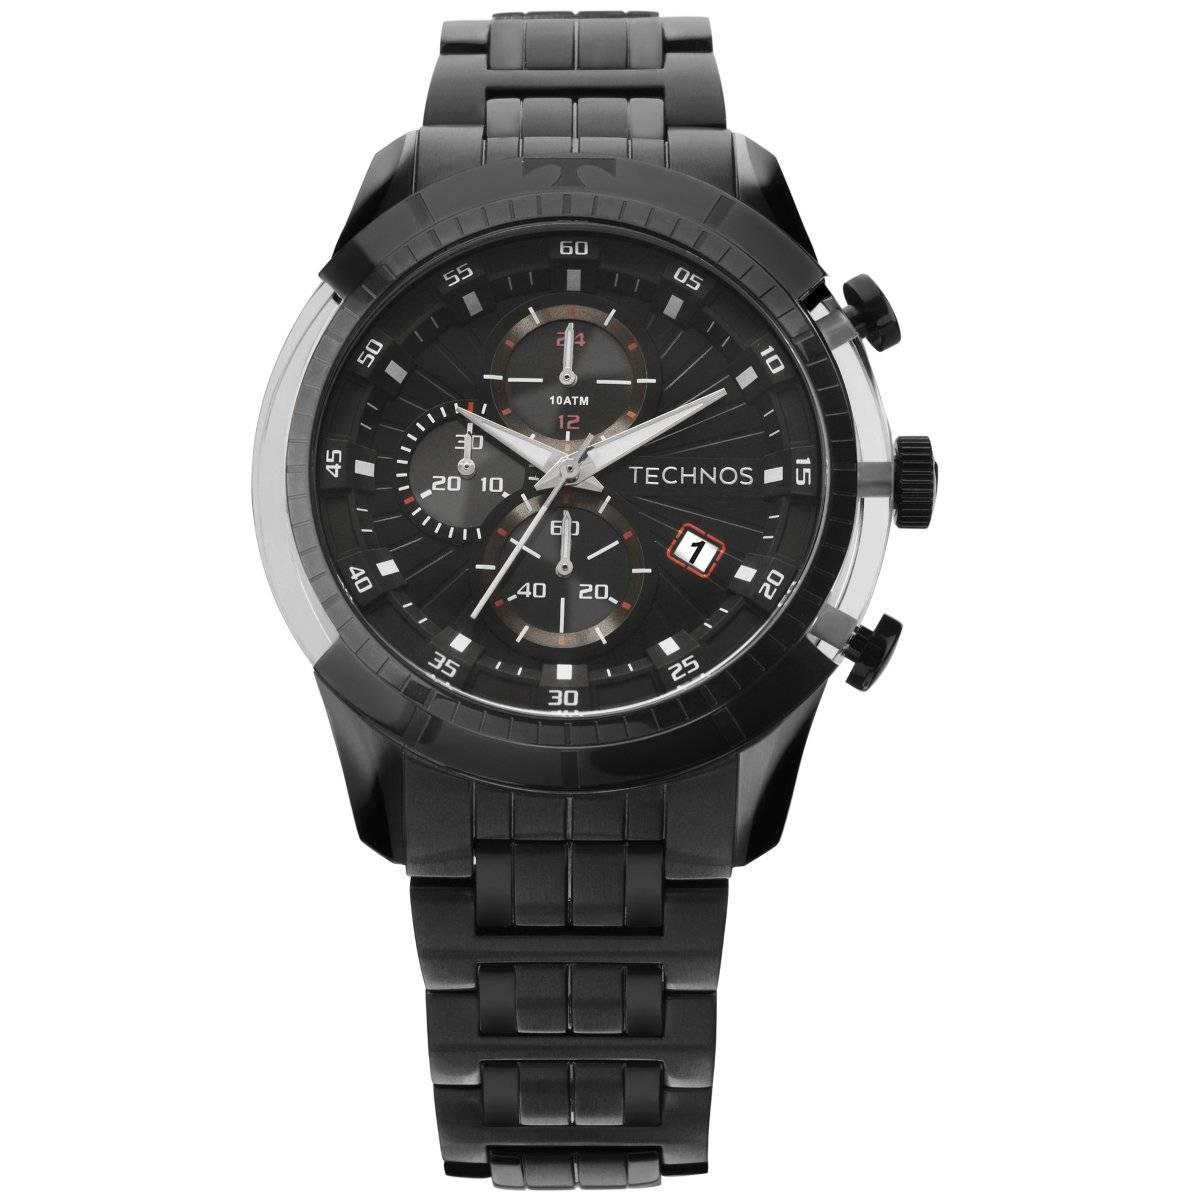 Relógio Technos Performance TS Carbon Masculino Quartz JS15EQ/4P